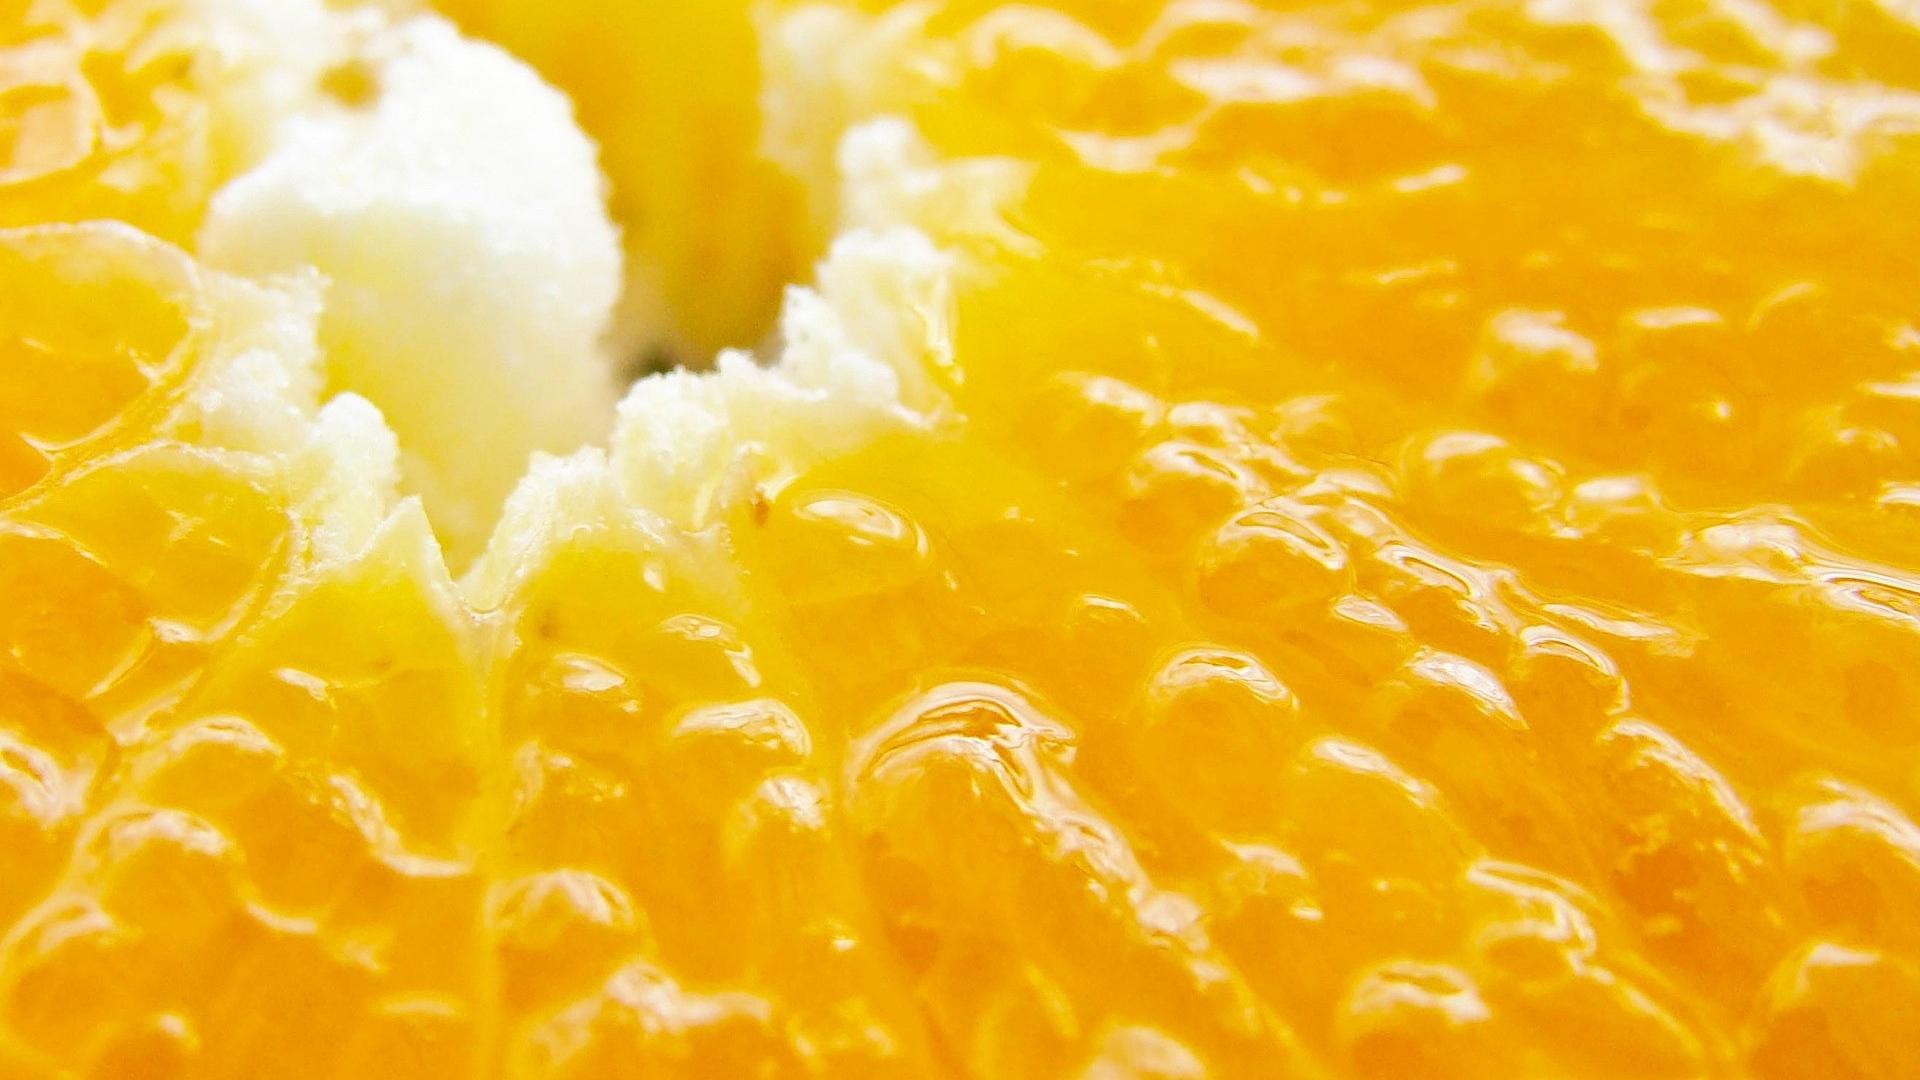 1920x1080 Wallpaper orange, fruit, macro, tasty